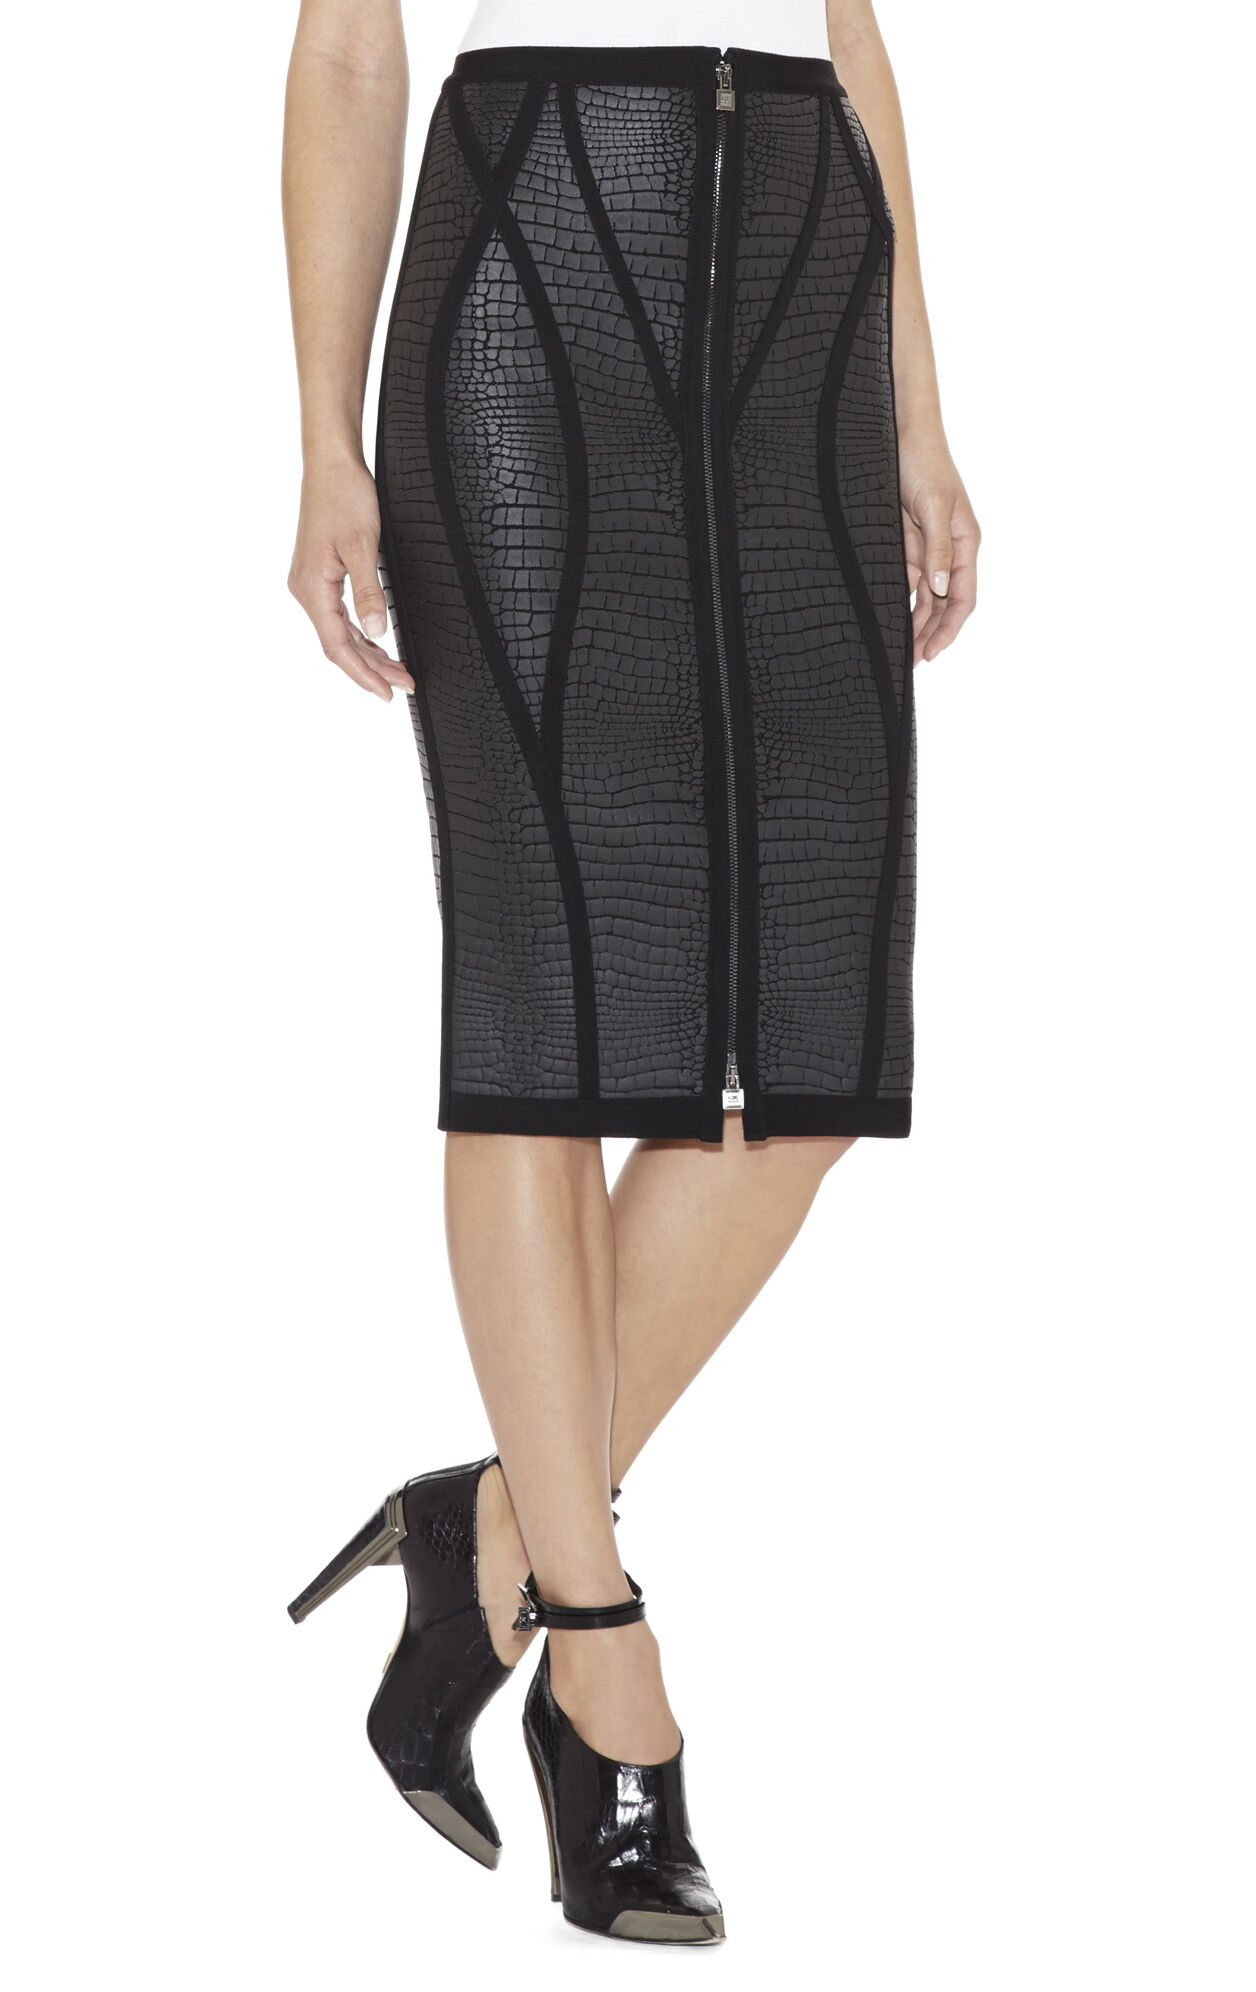 Blanca Crocodile-Print Pencil Skirt